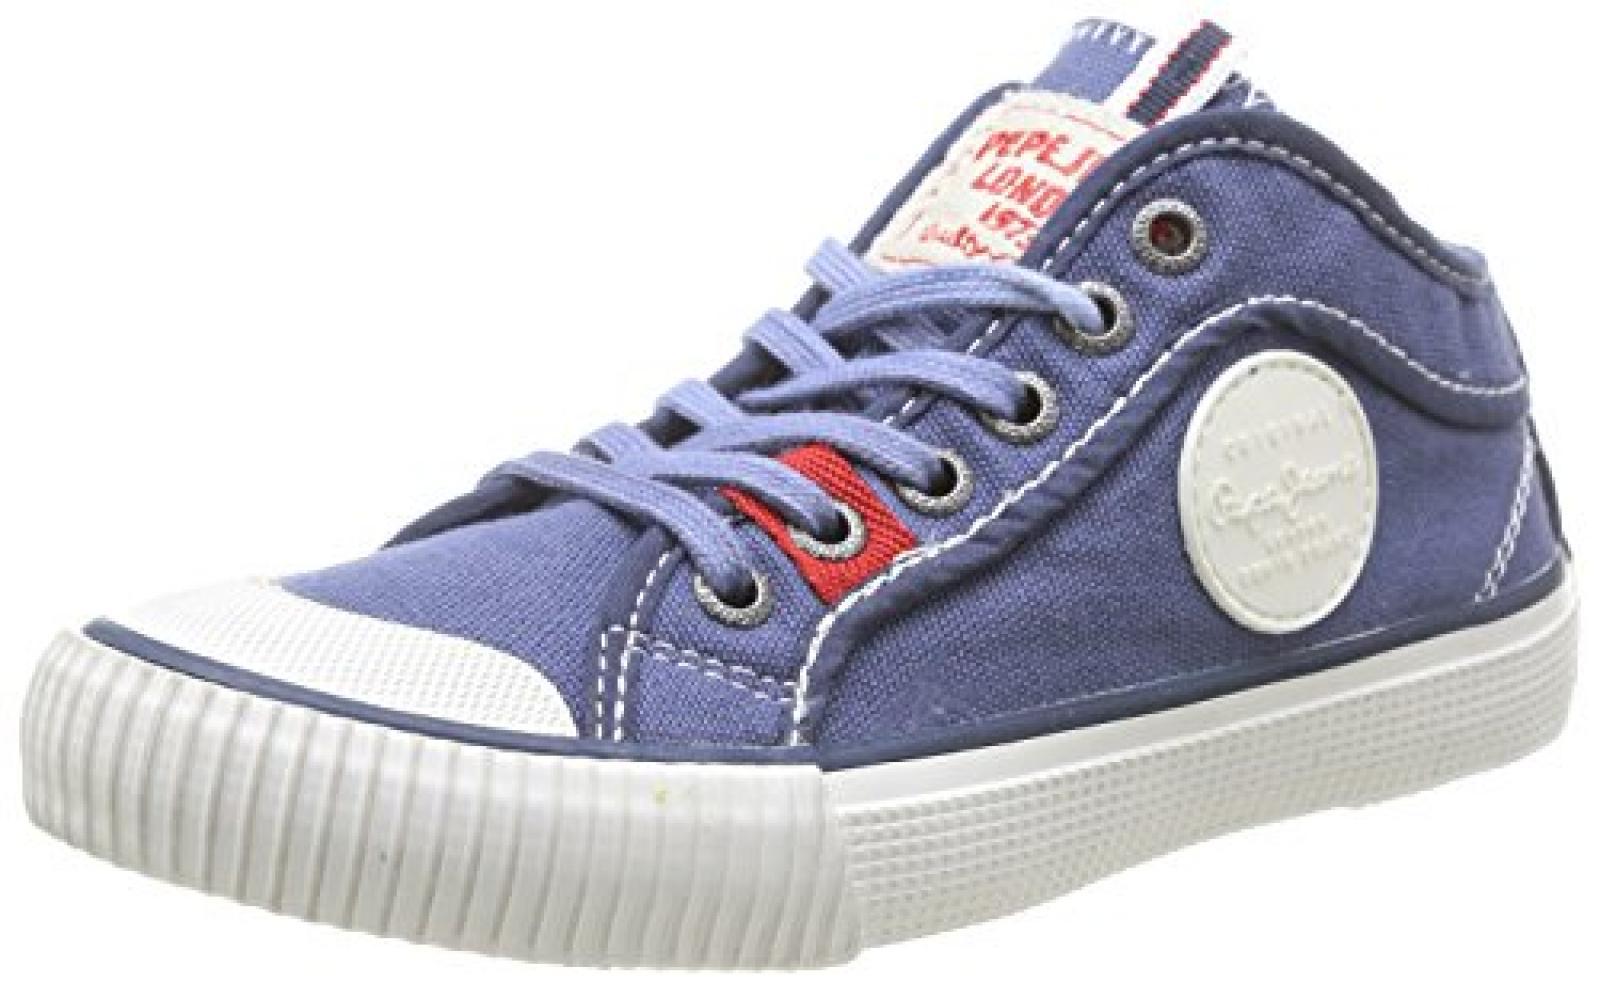 Pepe Jeans London INDUSTRY BASIC Jungen Sneakers